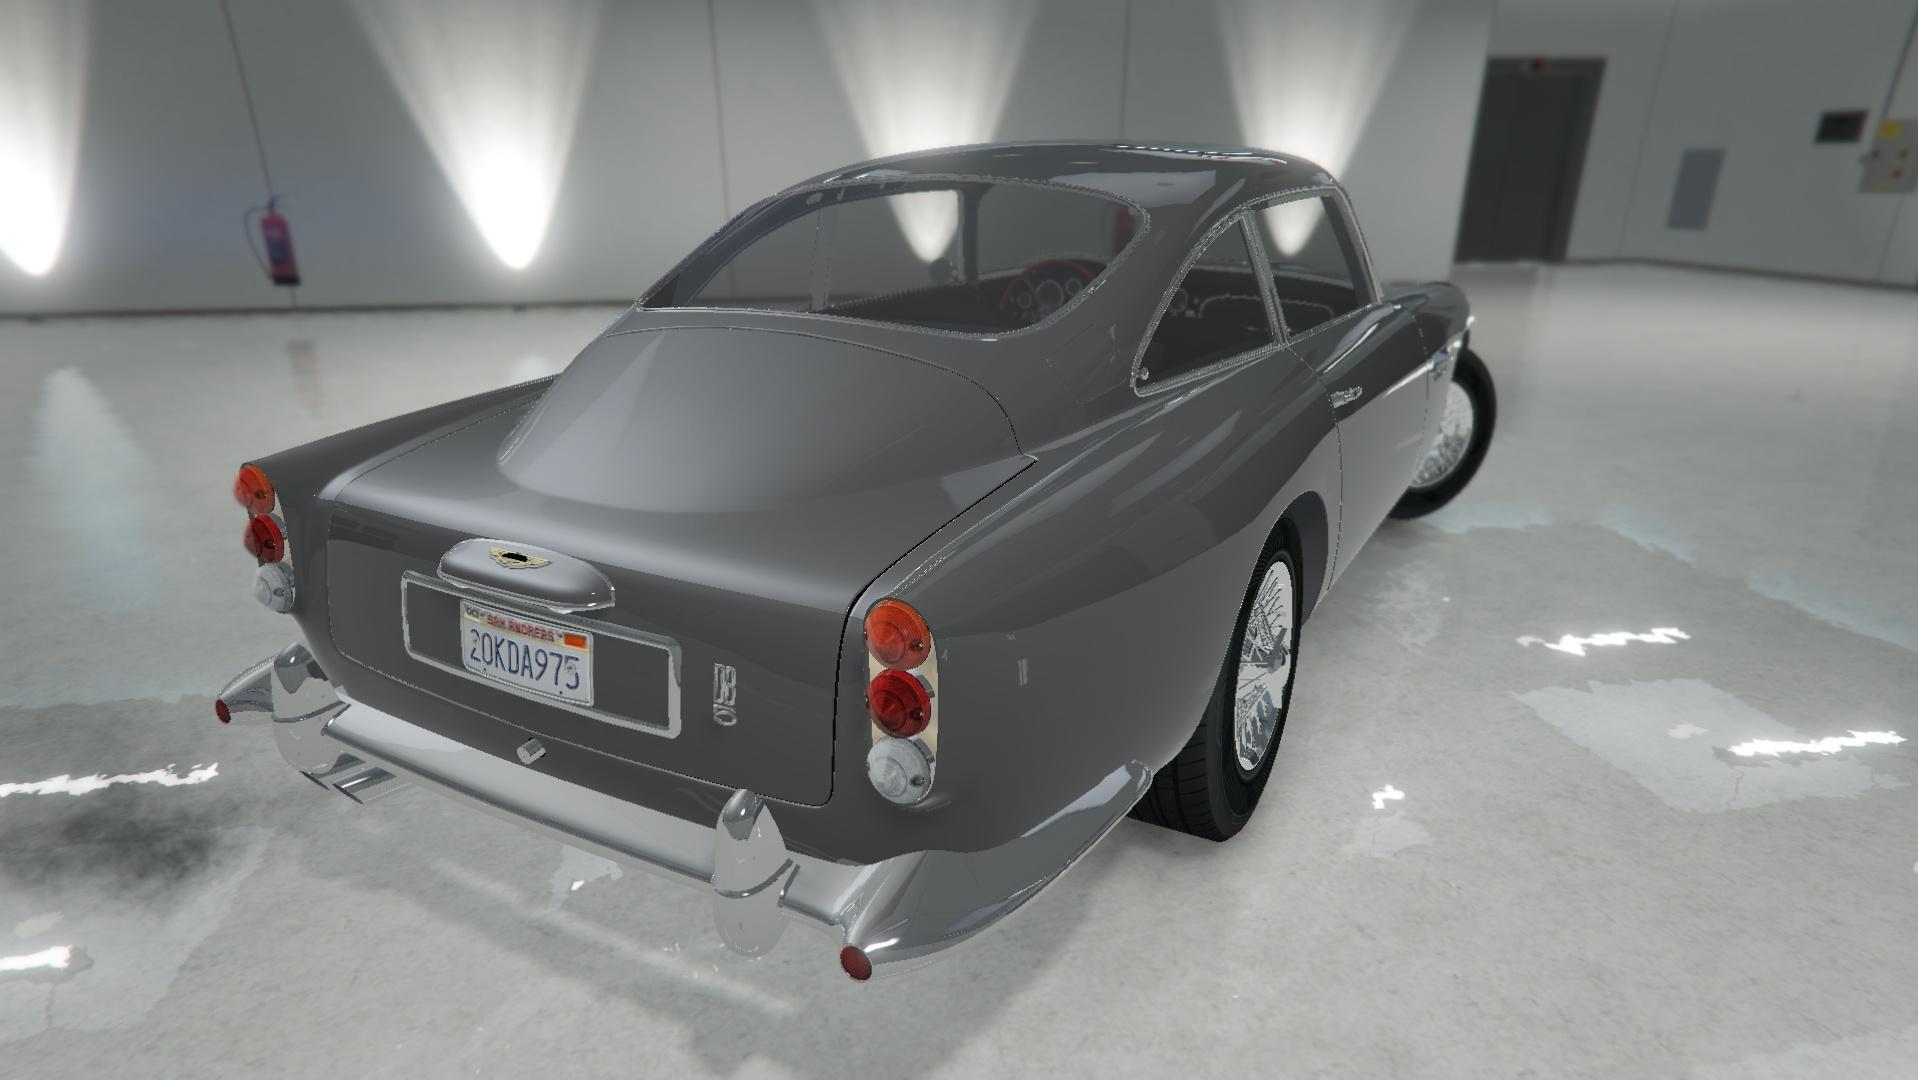 Aston Martin DB5 Vantage 1965 GTA5 Mods